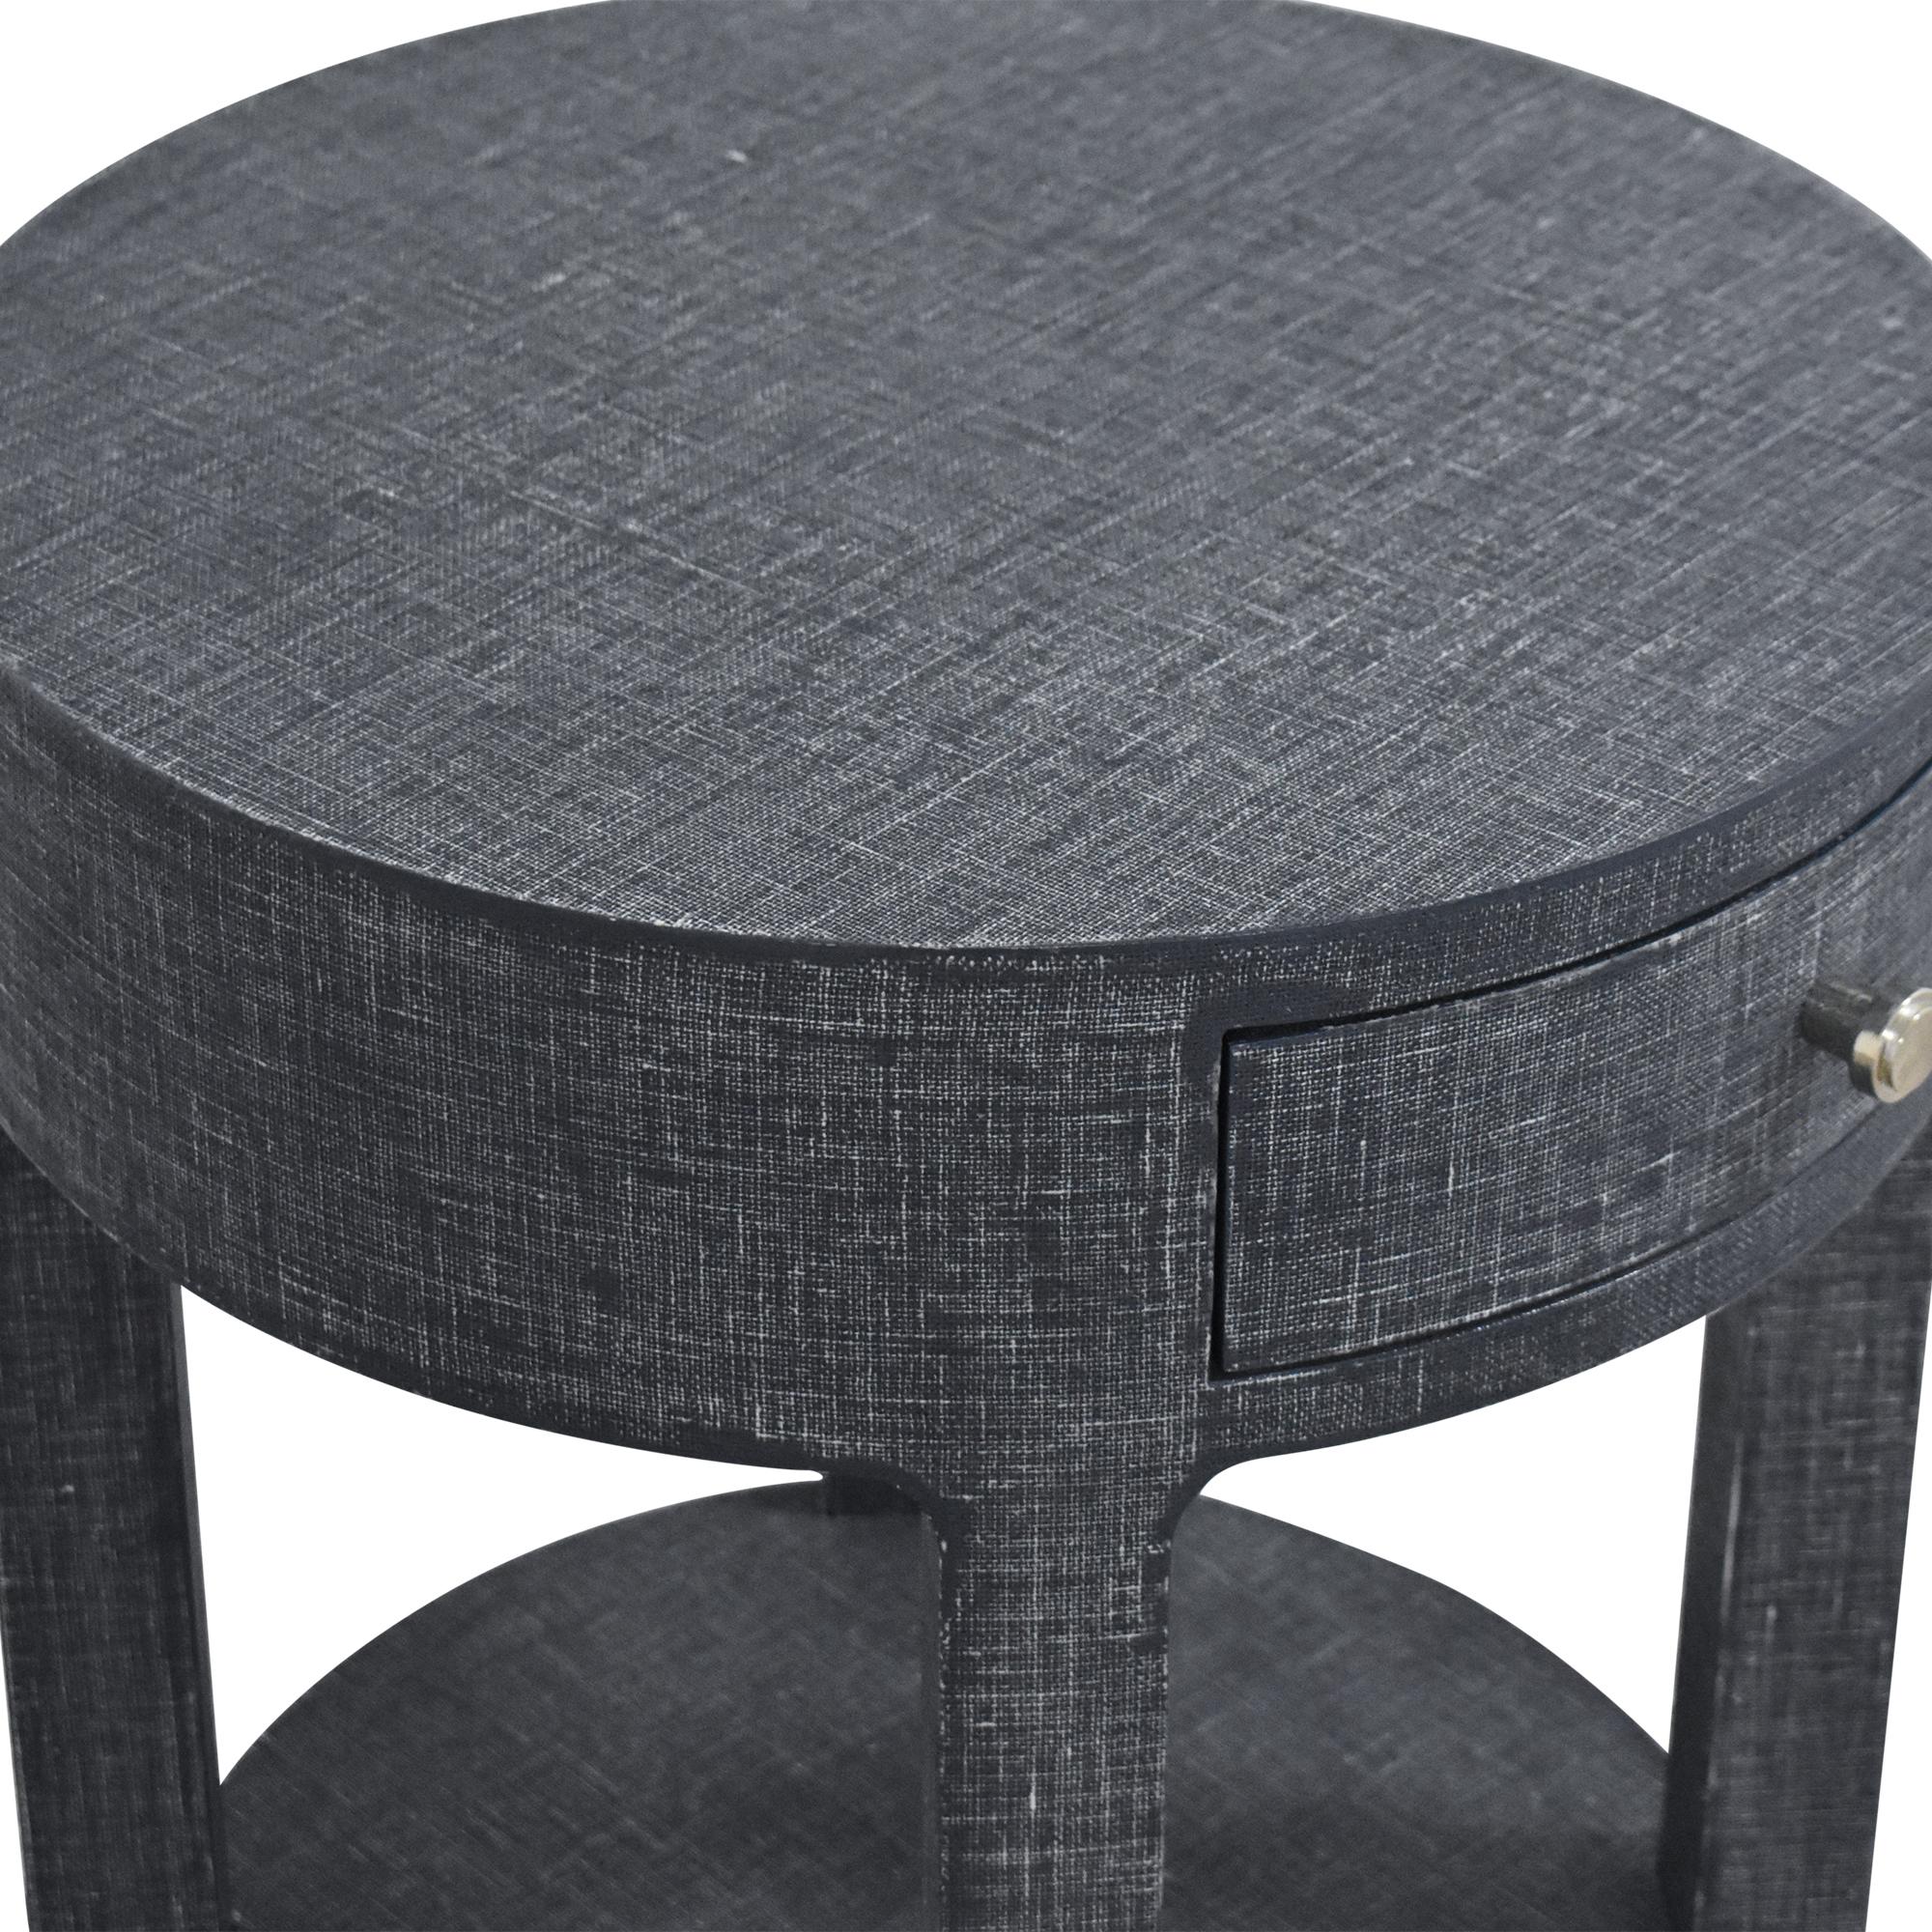 Bungalow 5 Dakota Round Side Table sale